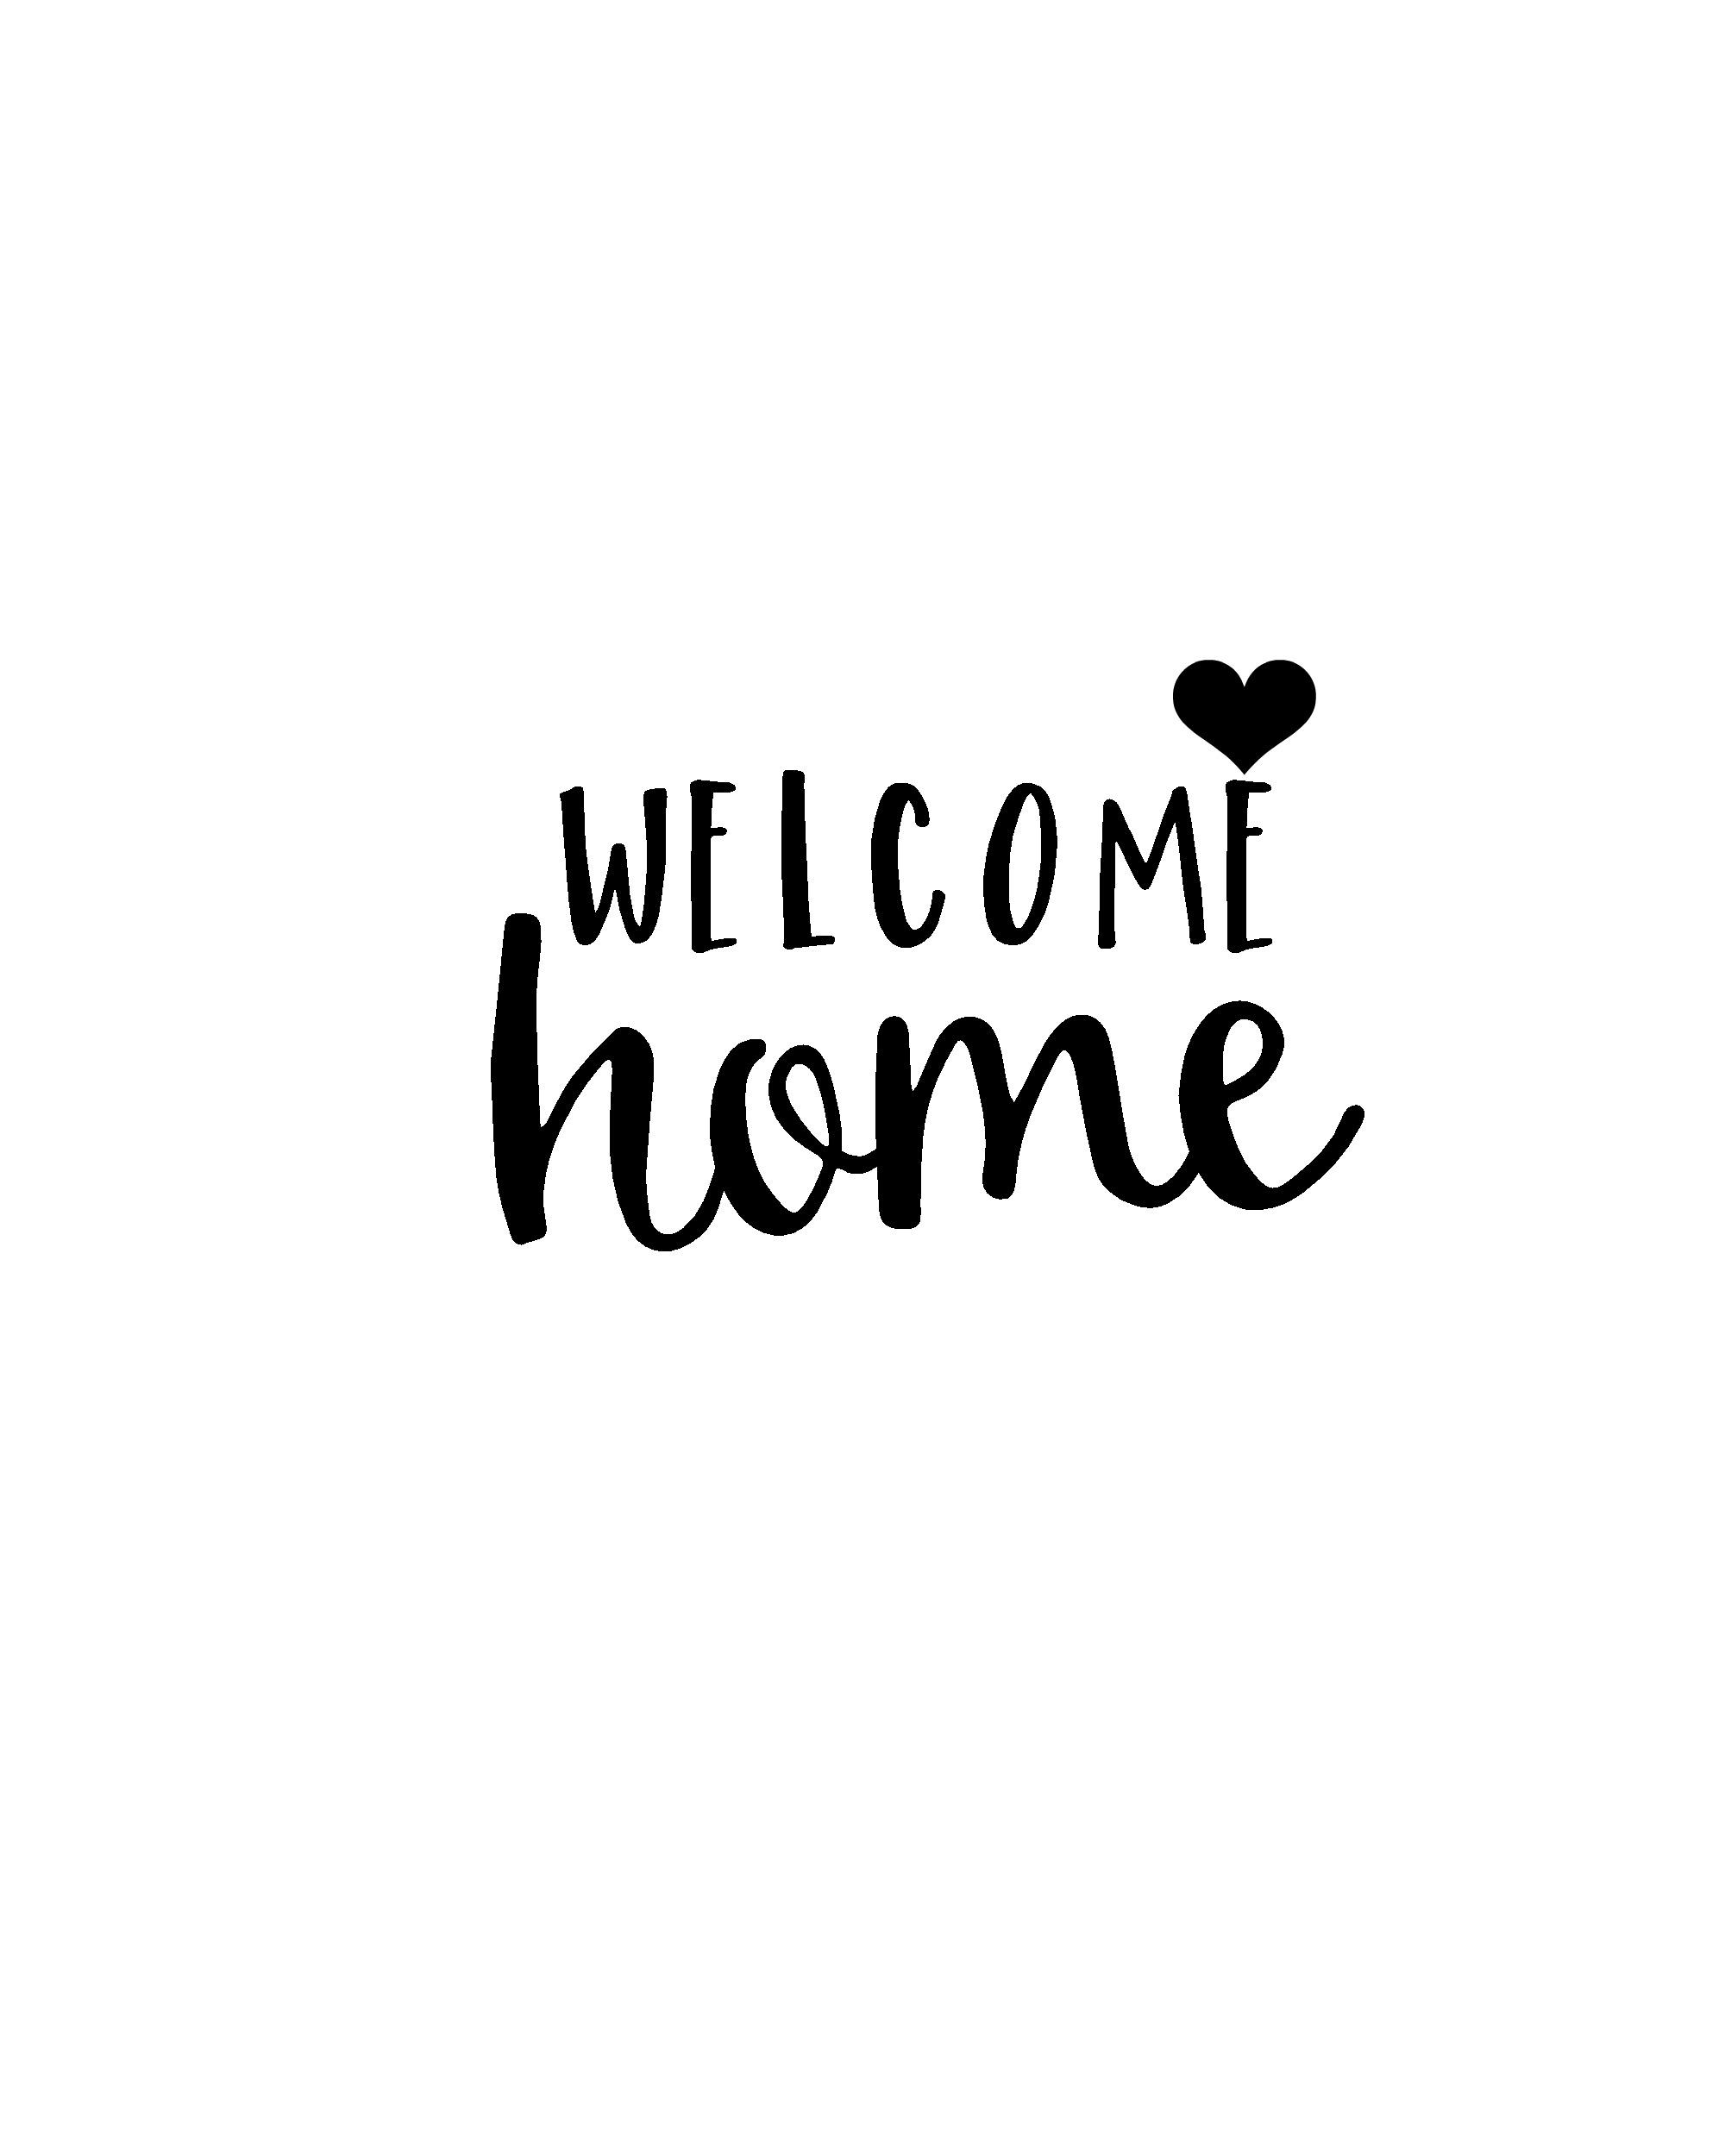 welcome home free printable.jpg